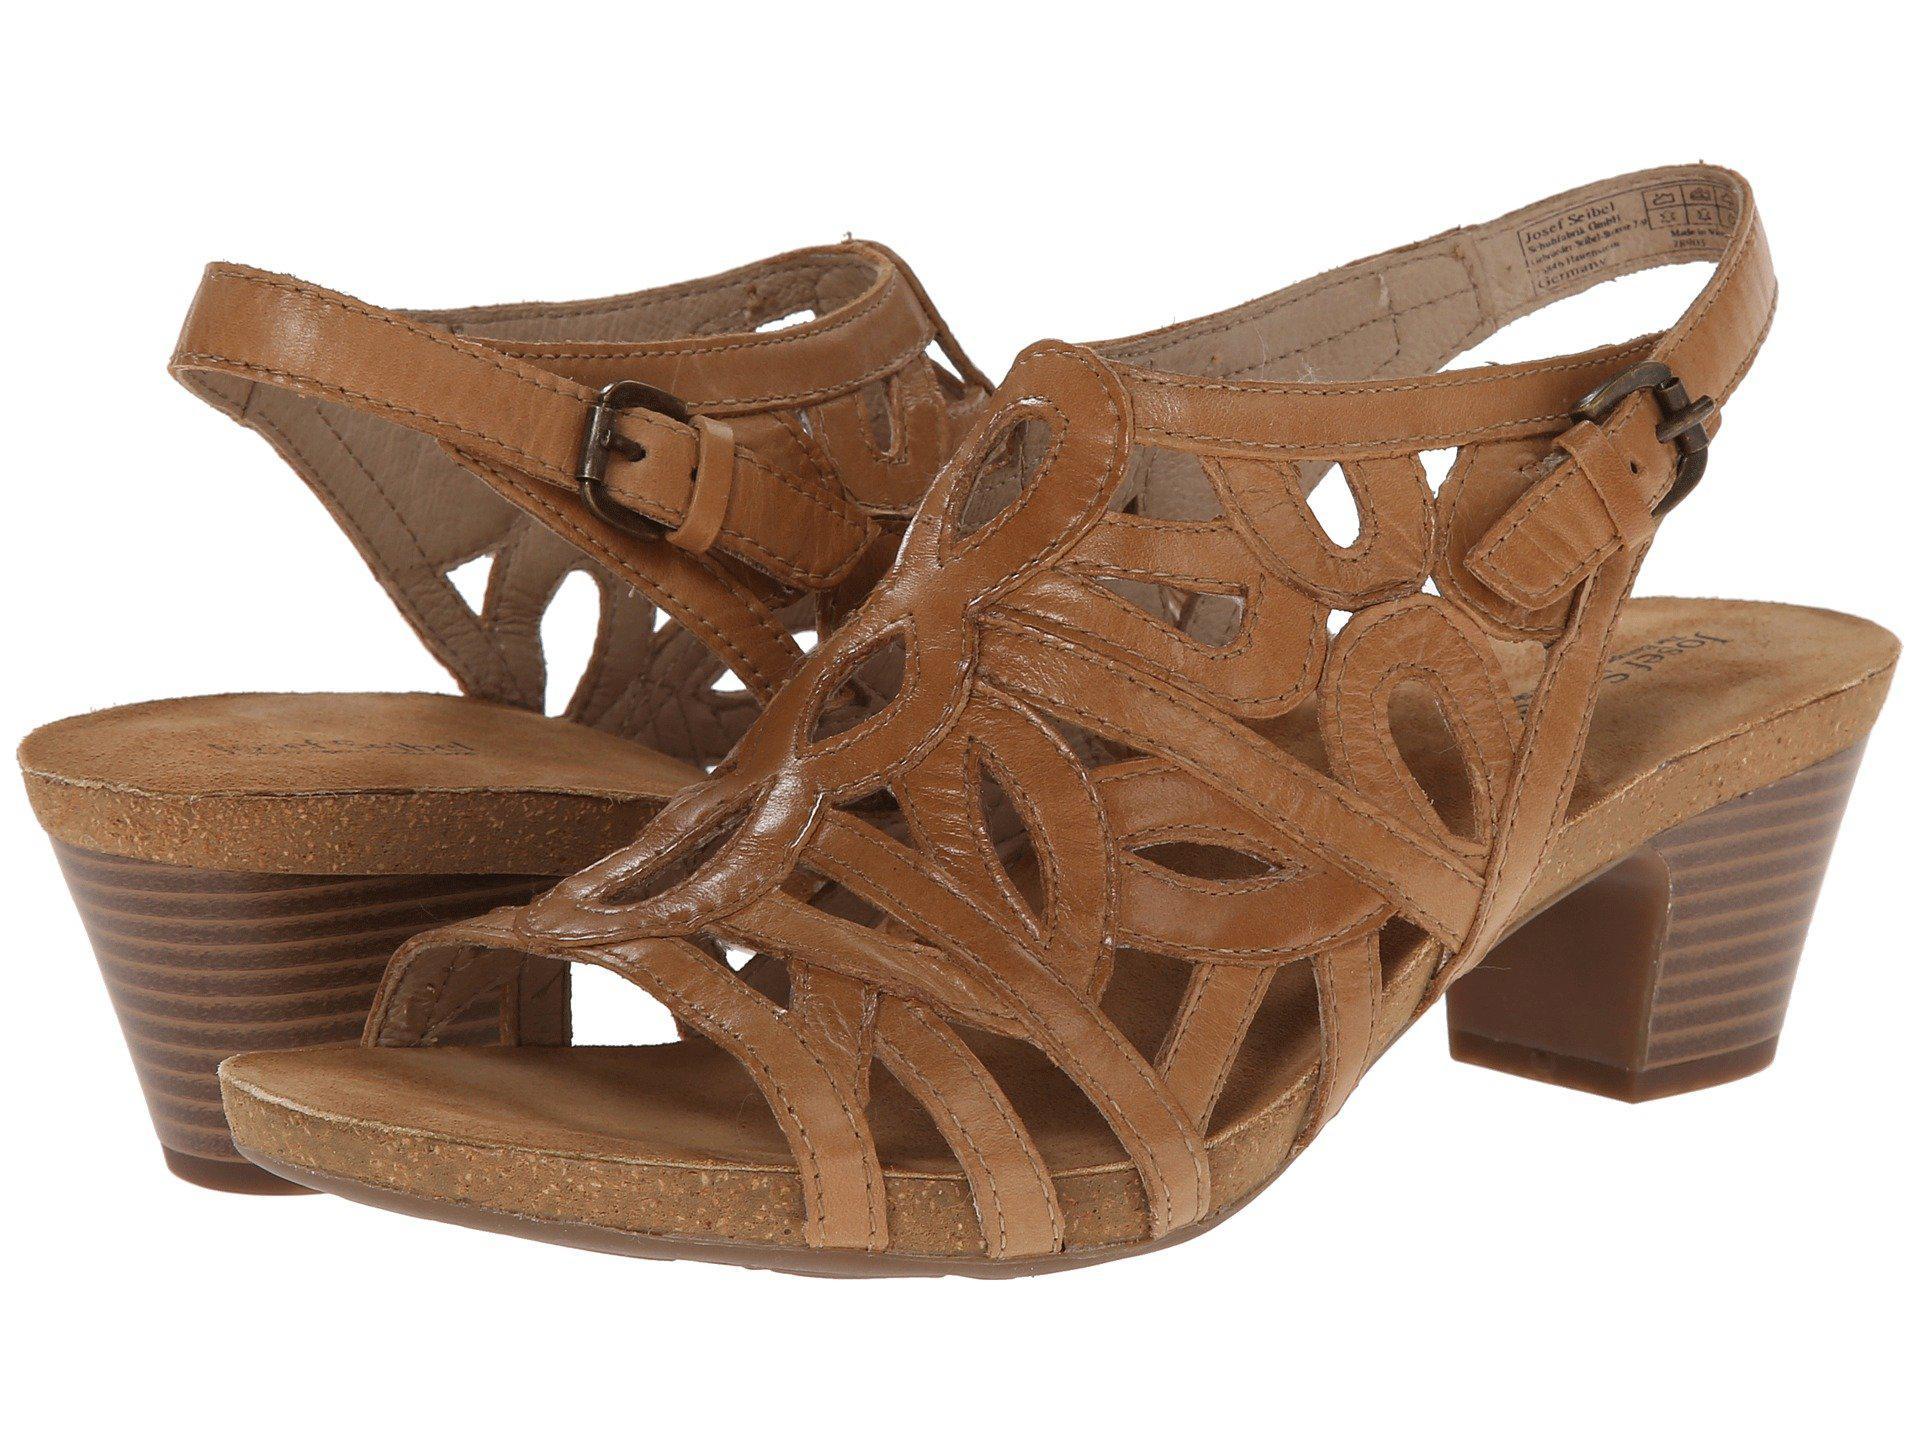 460717e81afd Lyst - Josef Seibel Ruth 03 (camel Equipe) Women's Dress Sandals in ...